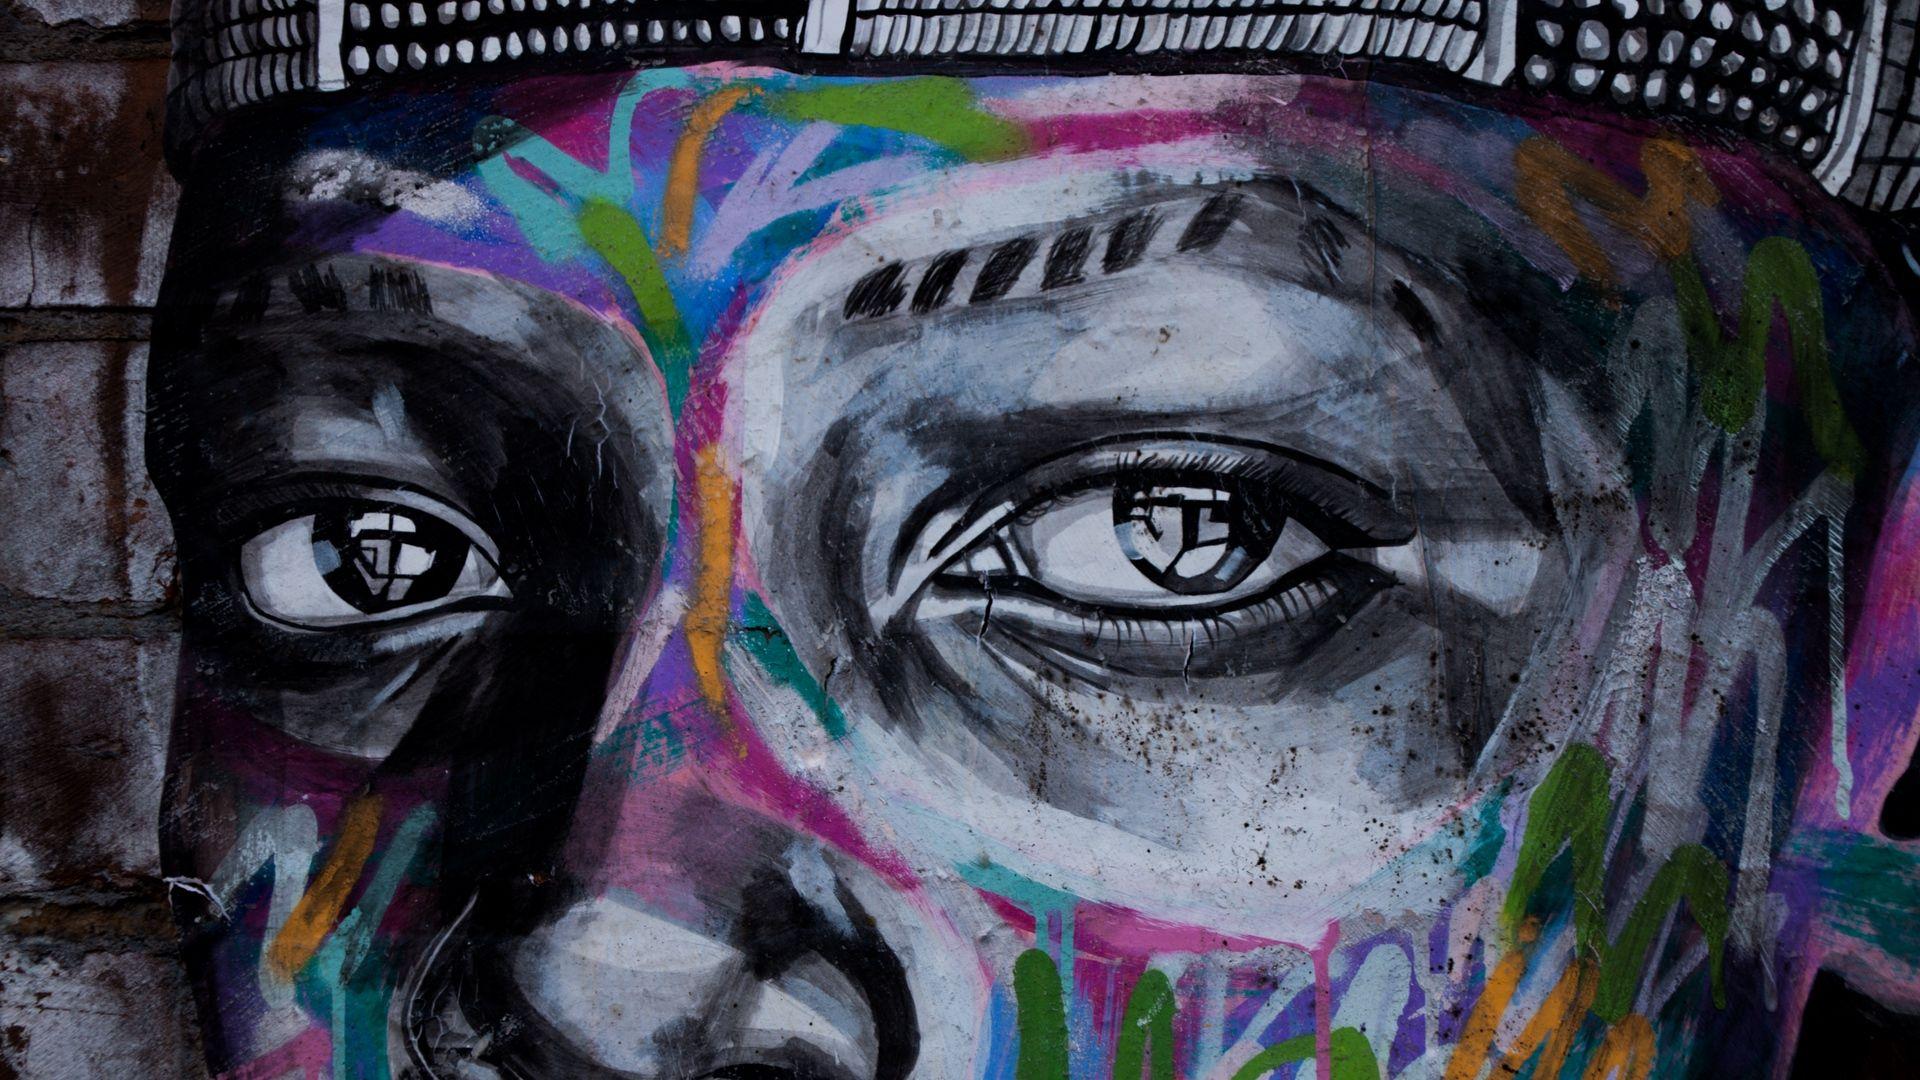 Download wallpaper 1920x1080 graffiti, eyes, art, street